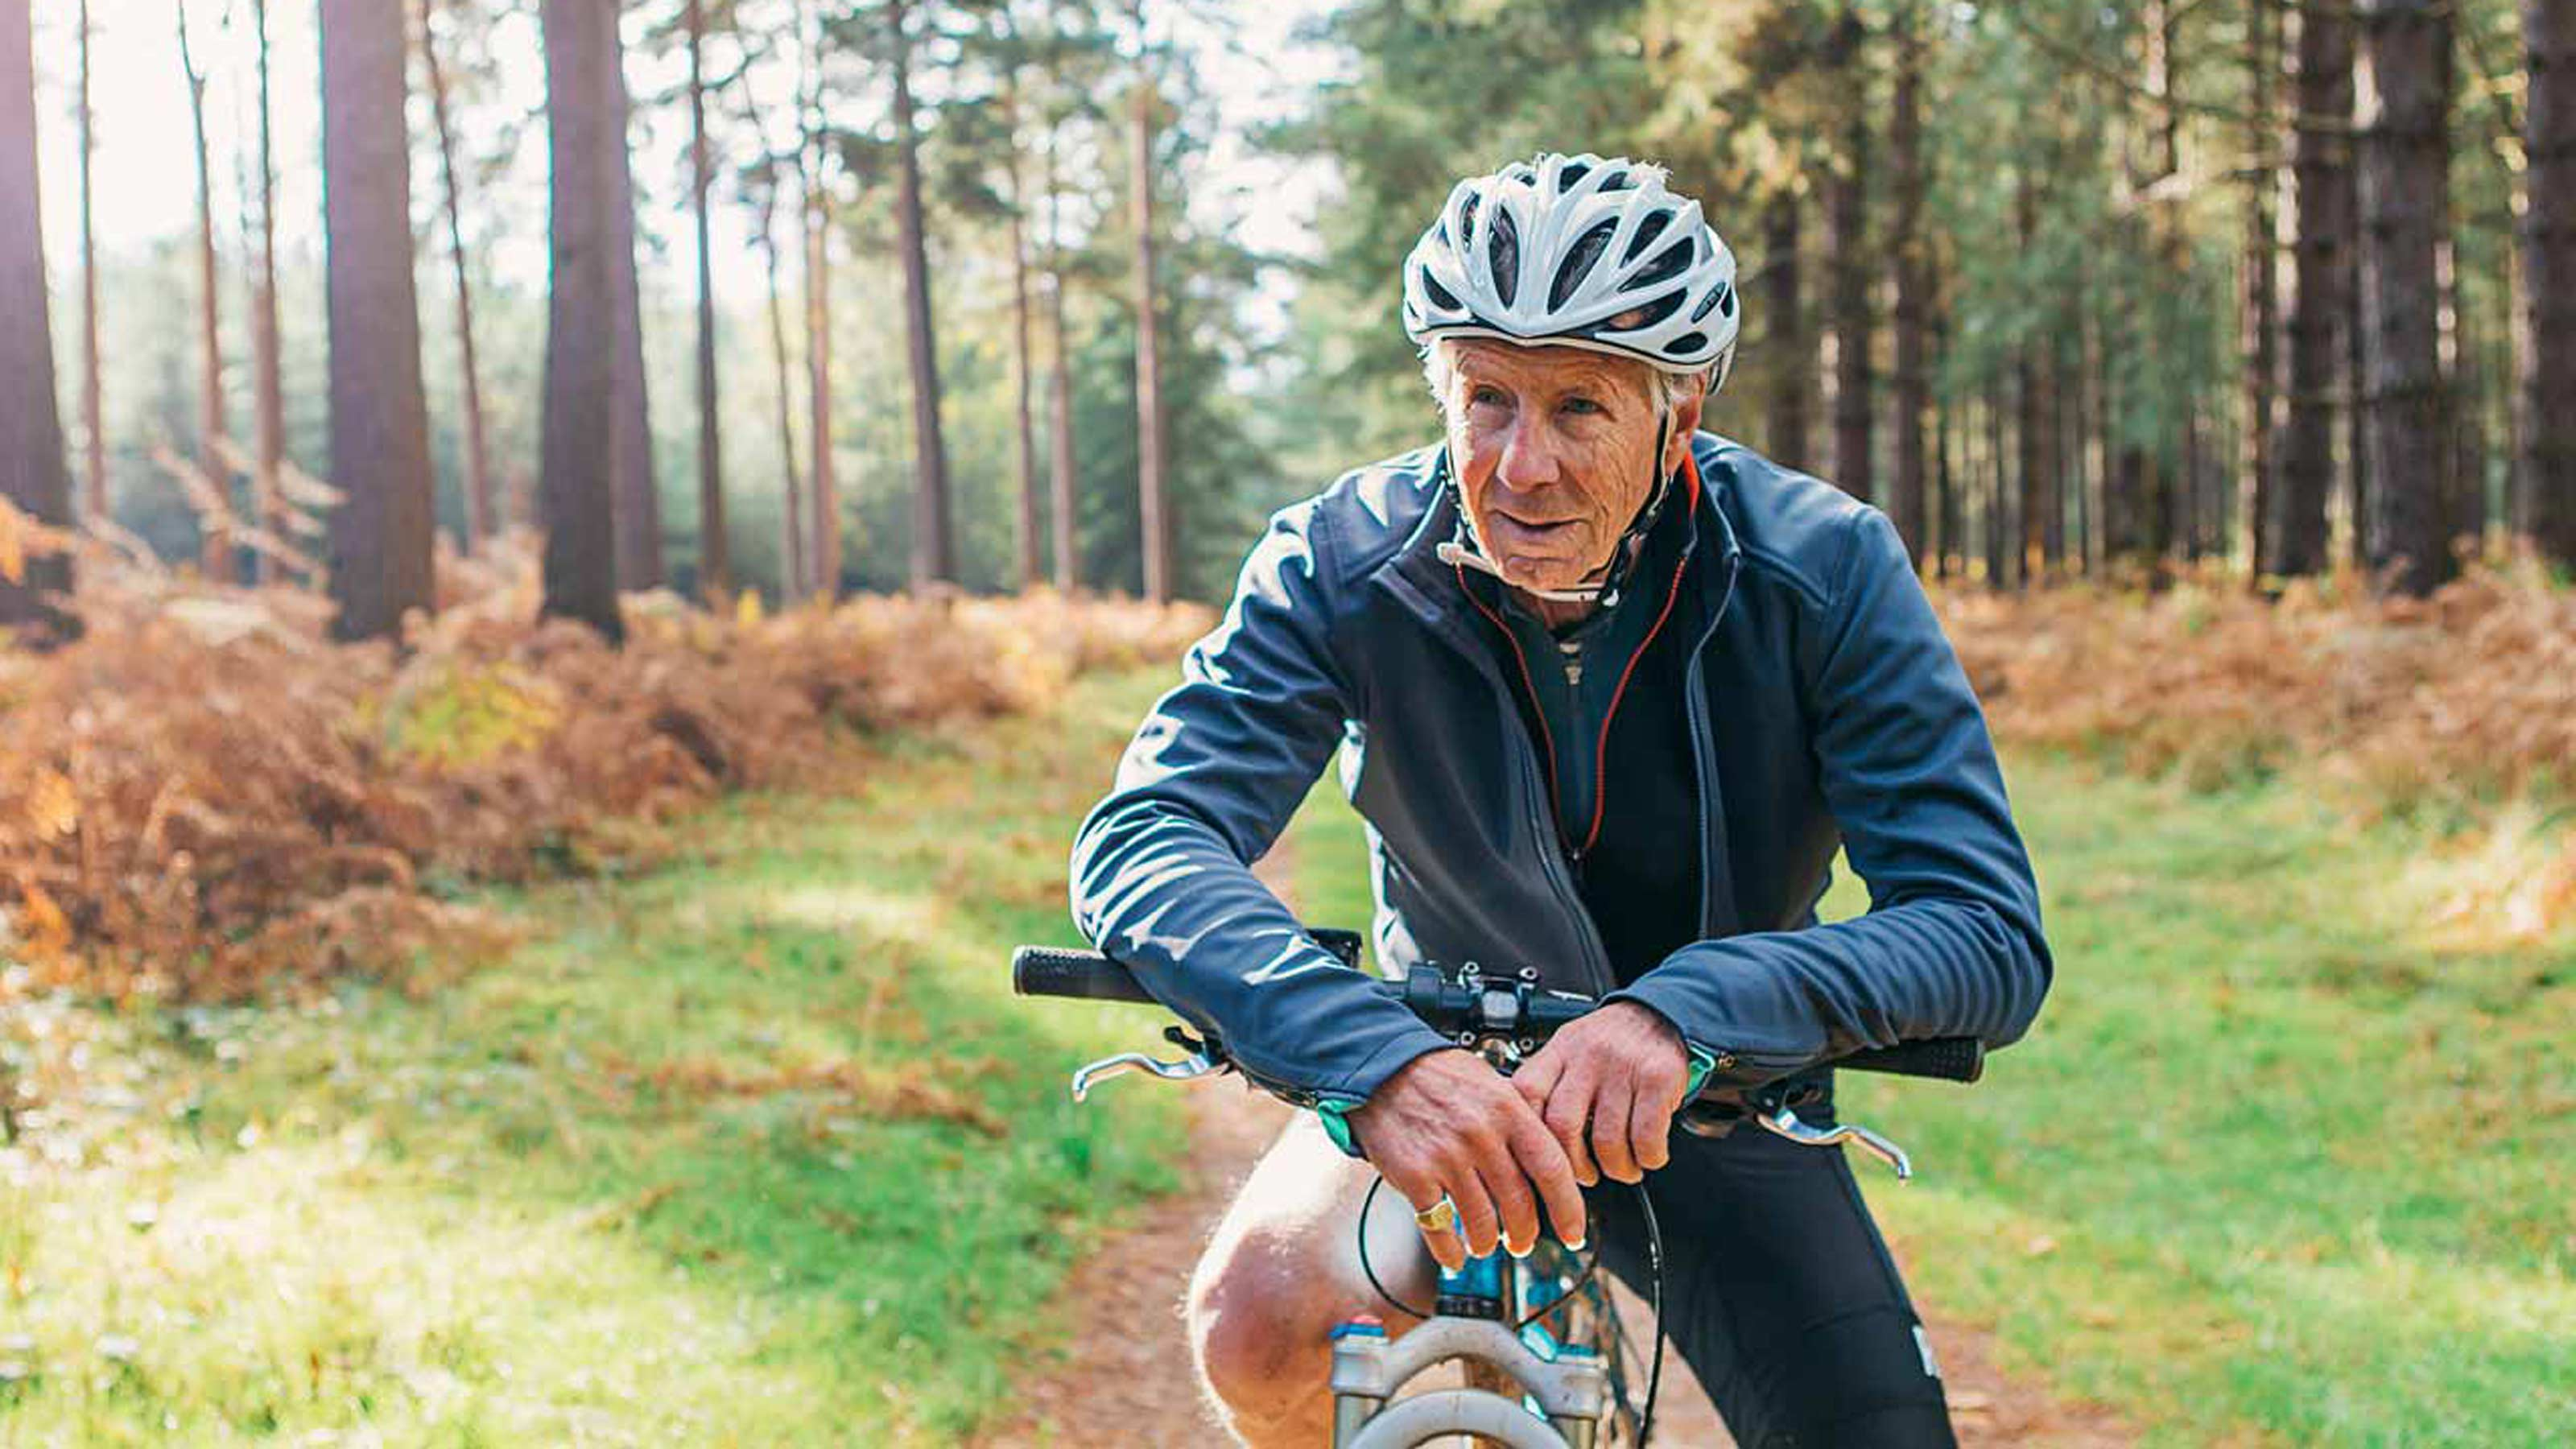 Making the Best of a Forced Retirement | Kiplinger